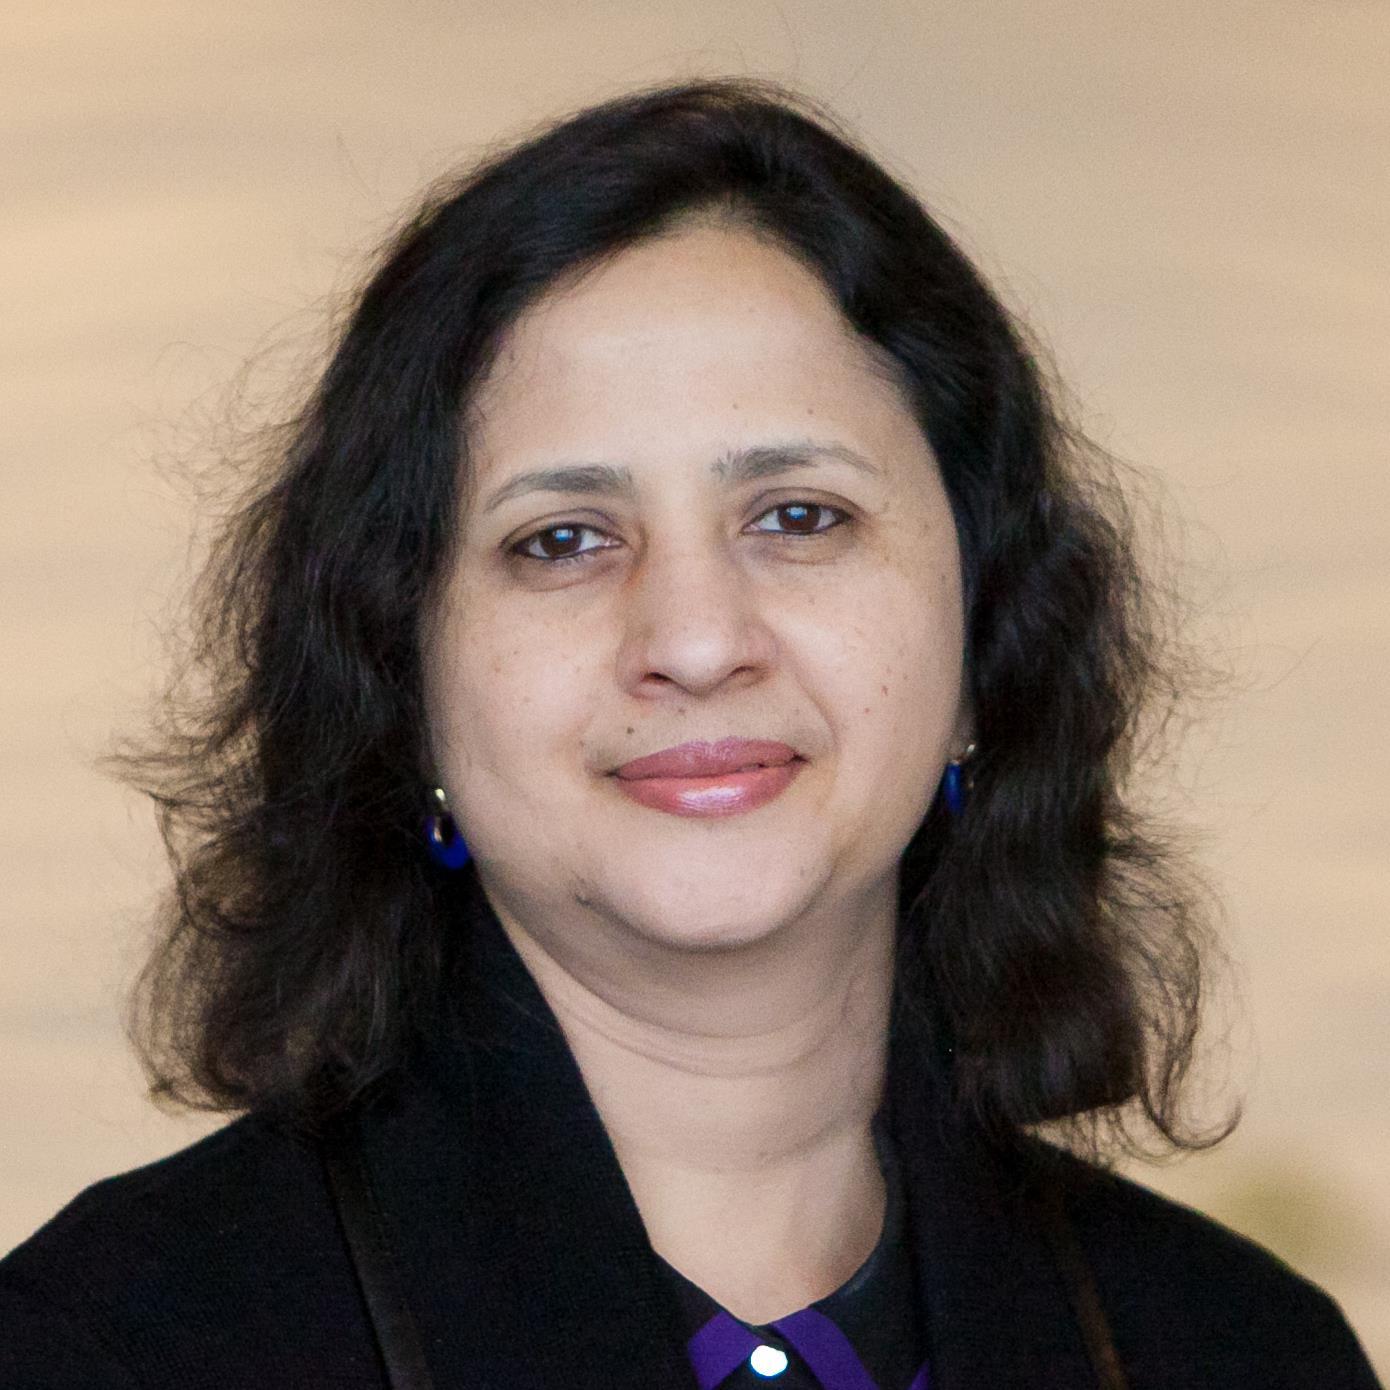 Accenture_Vidula Bhave.jpg